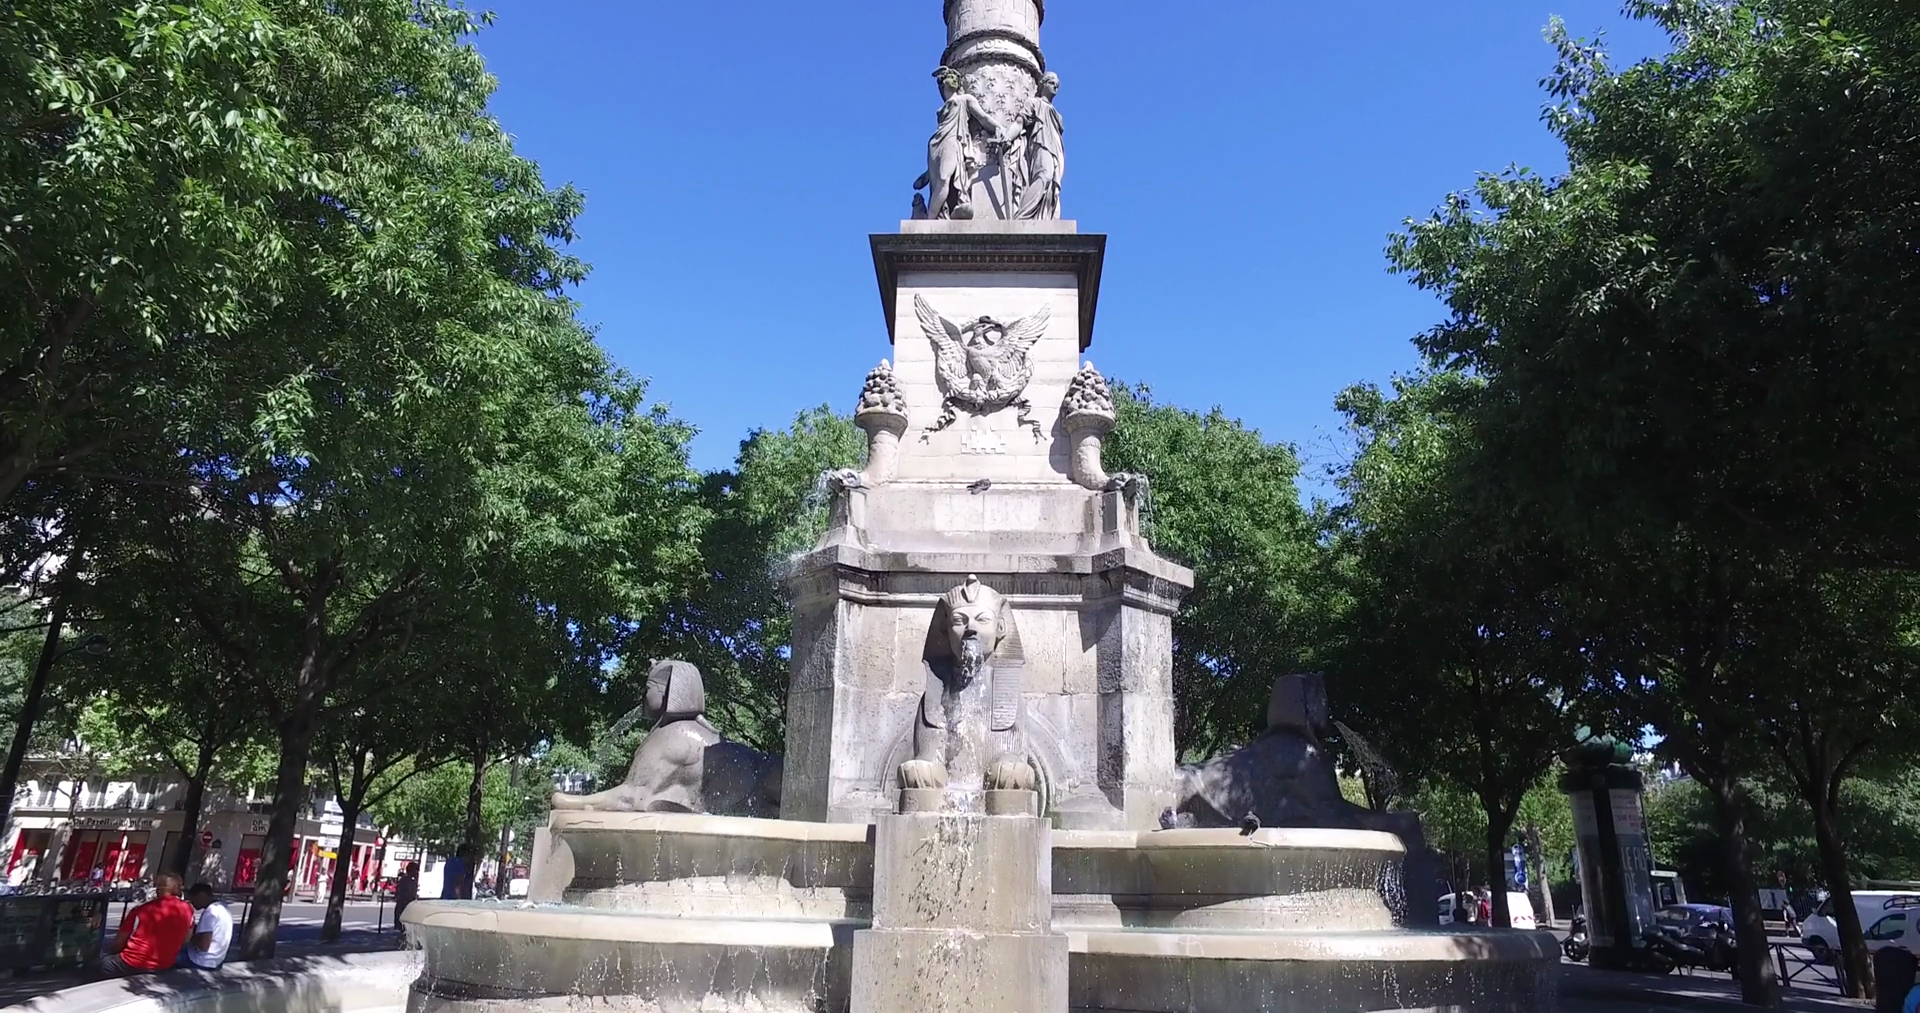 Fountain sphinx photo